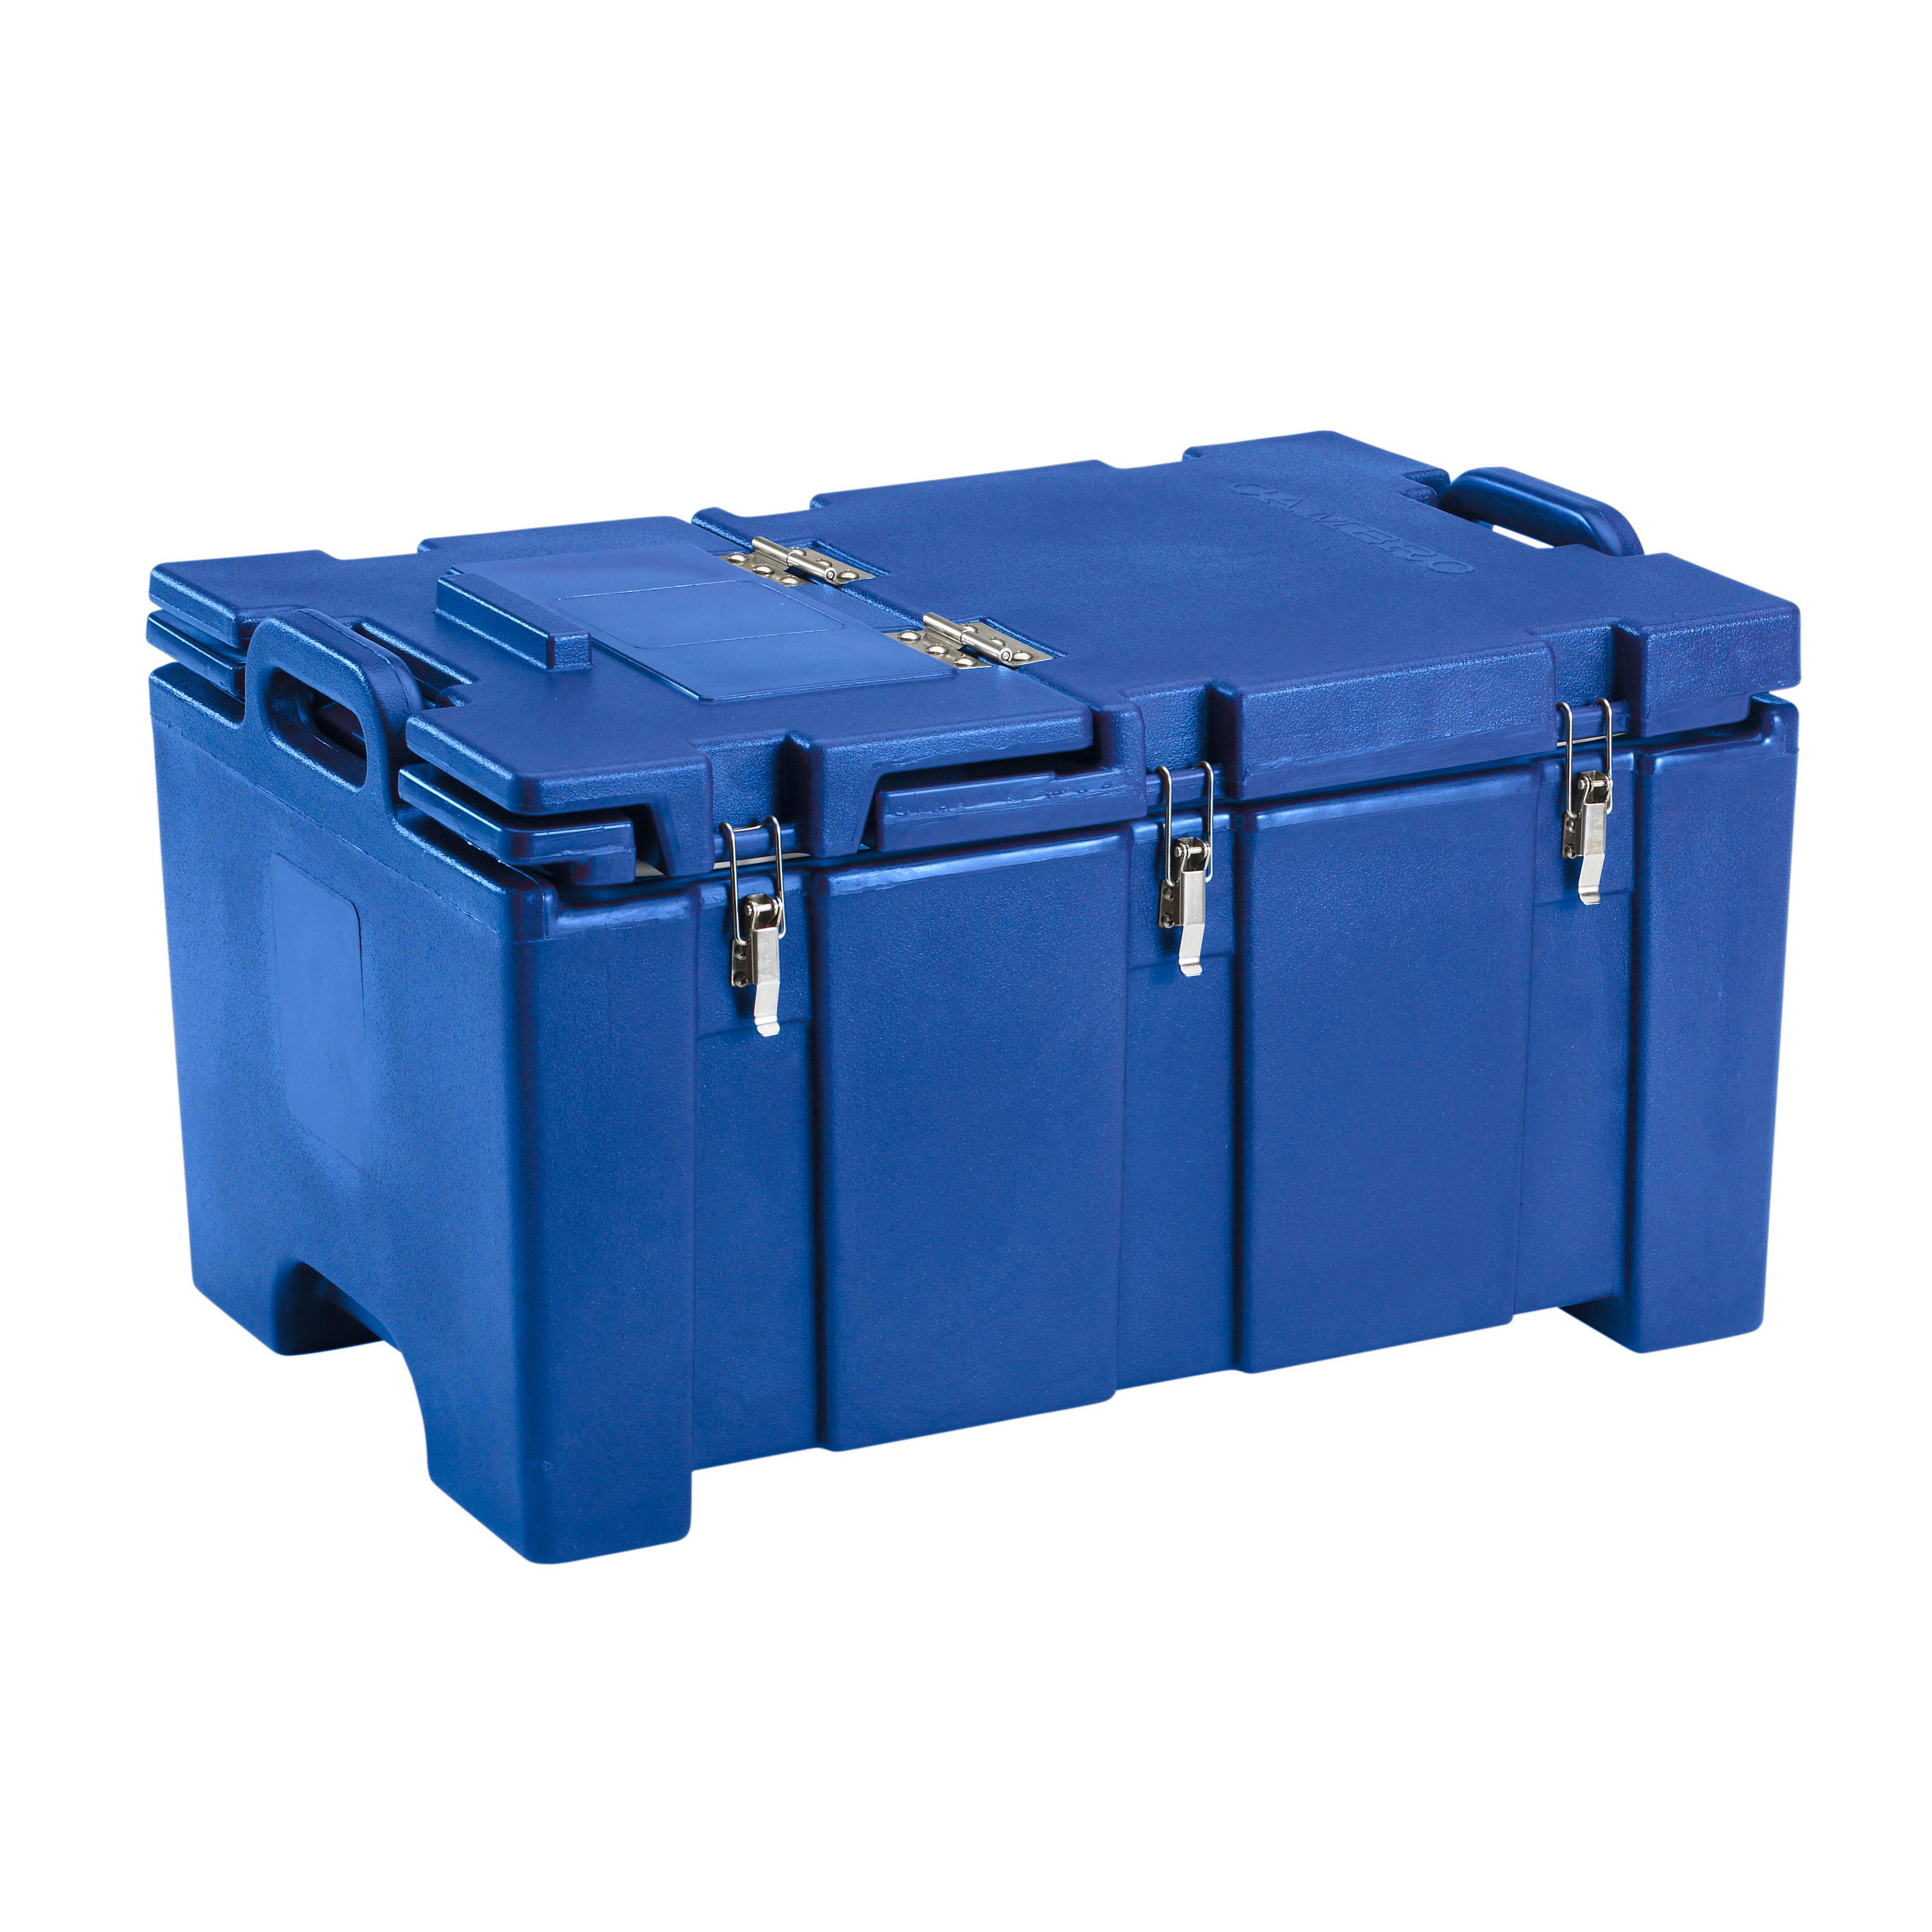 Cambro 100MPCHL186 insulated food storage